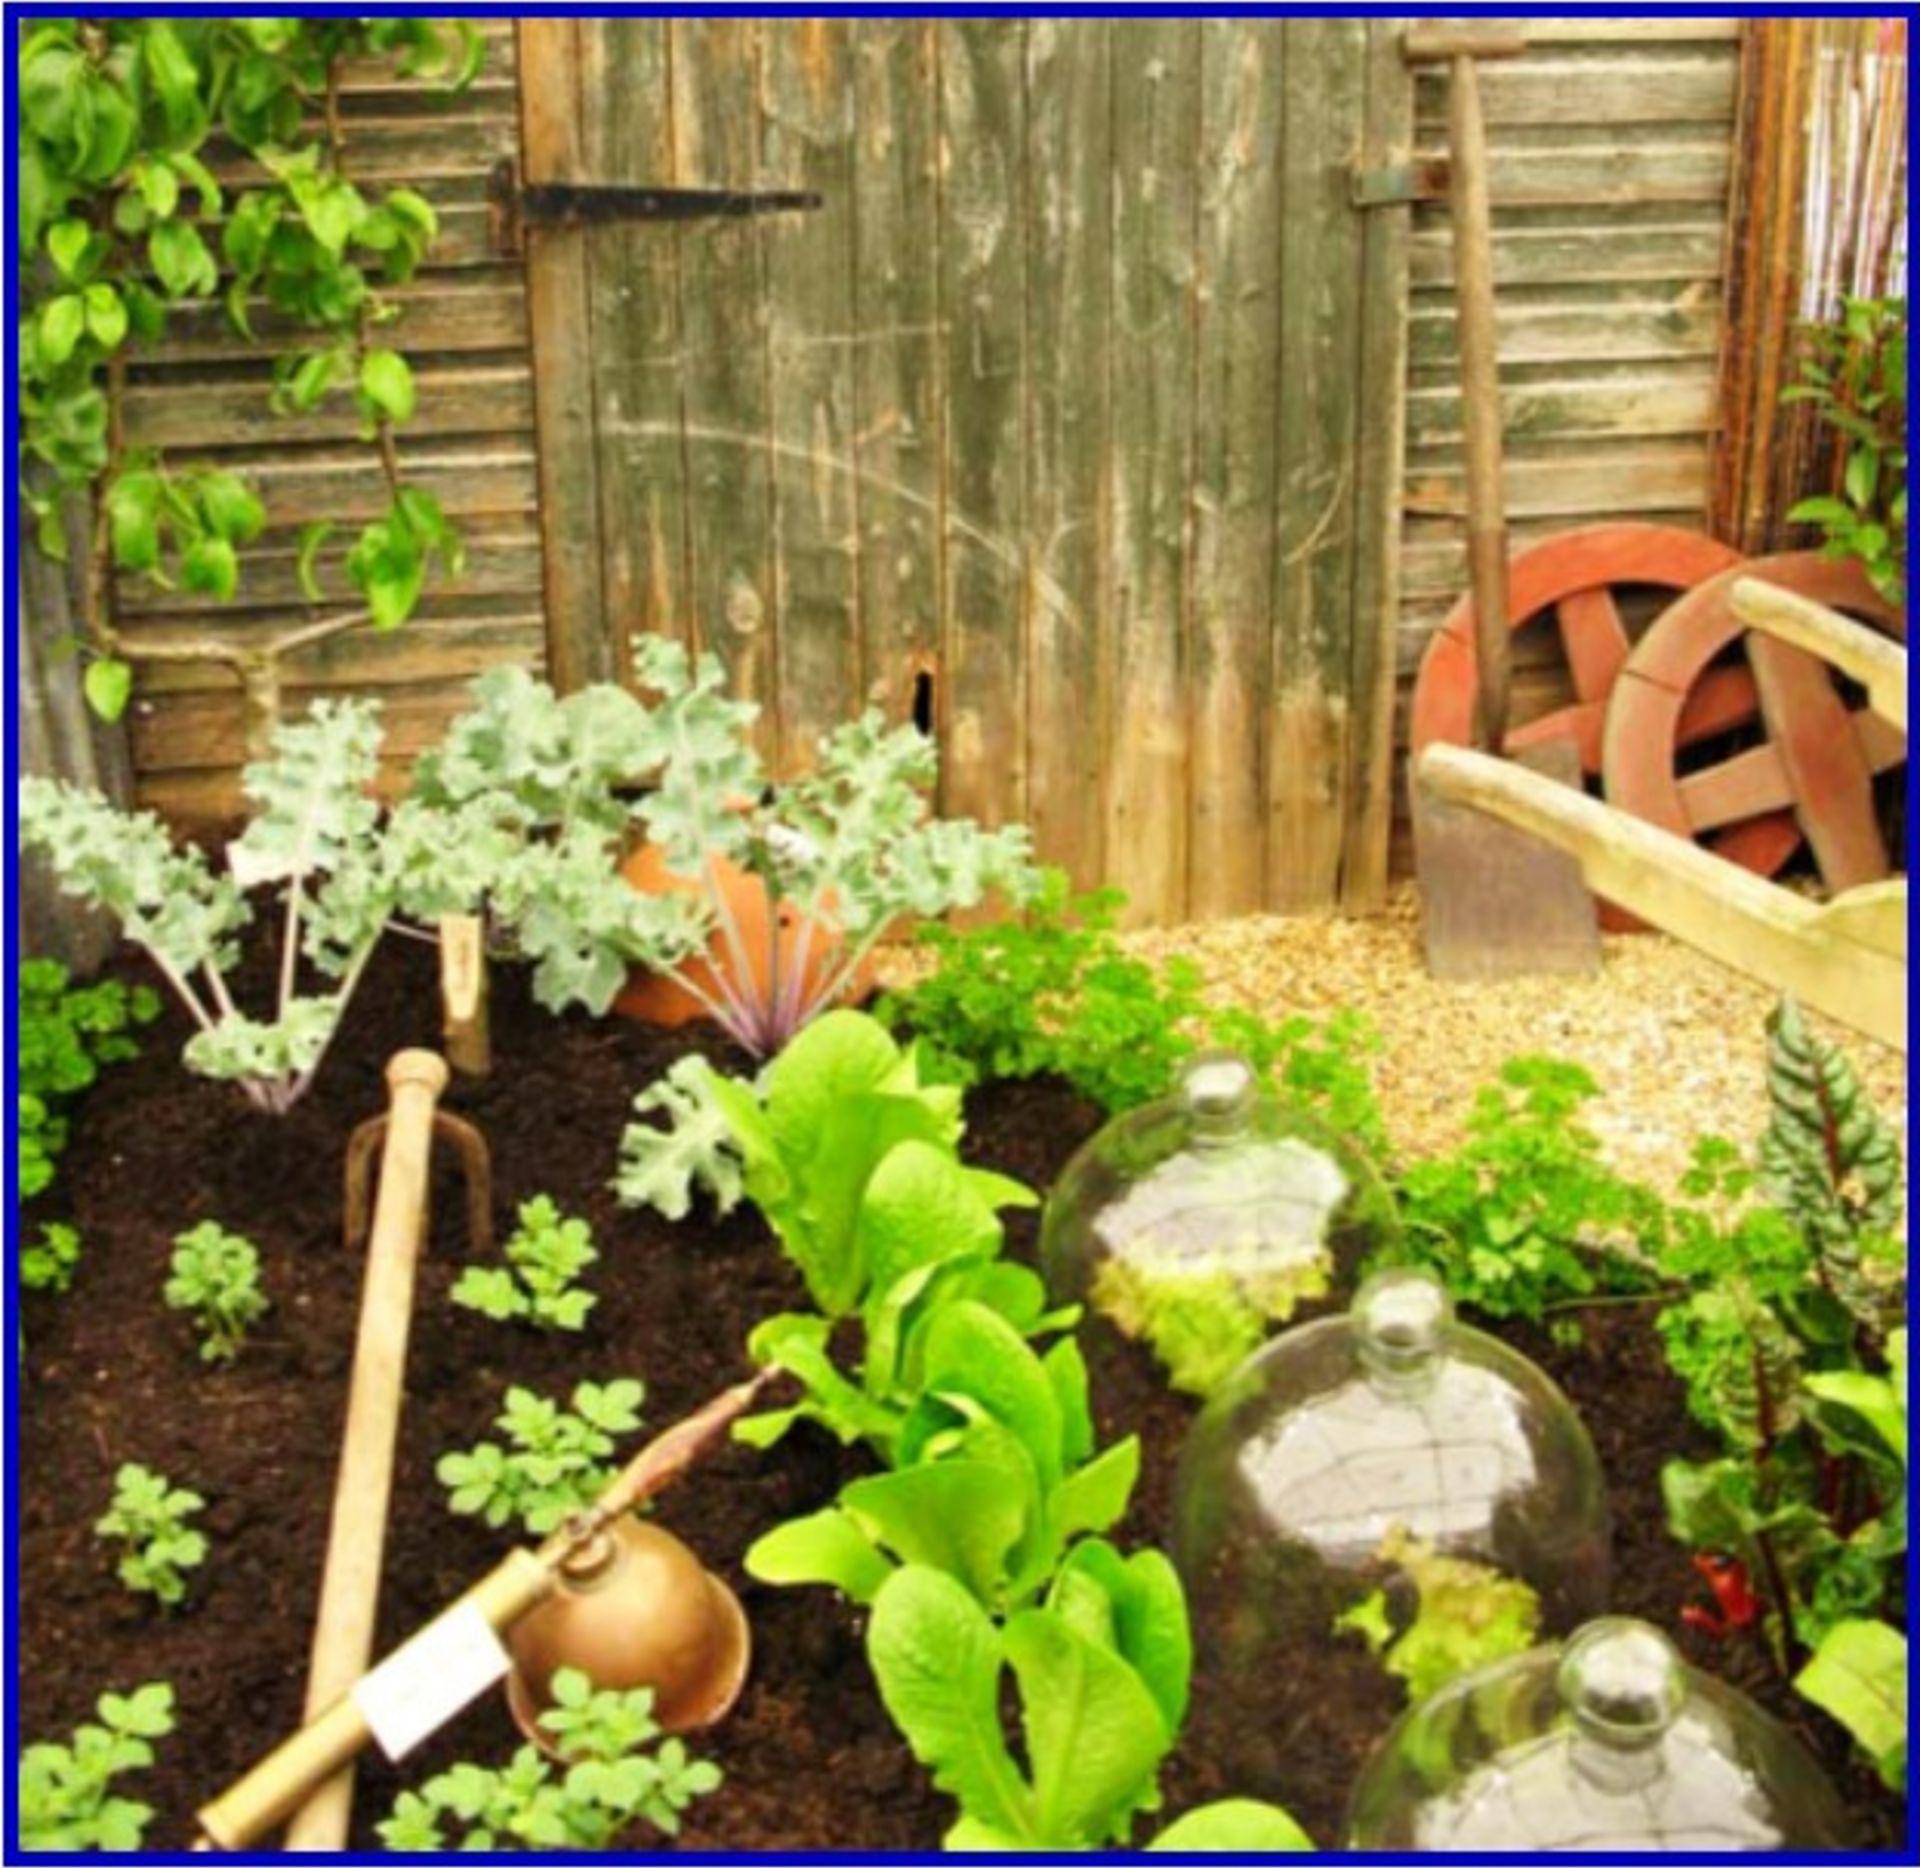 Planting Your Own Vegetable Garden